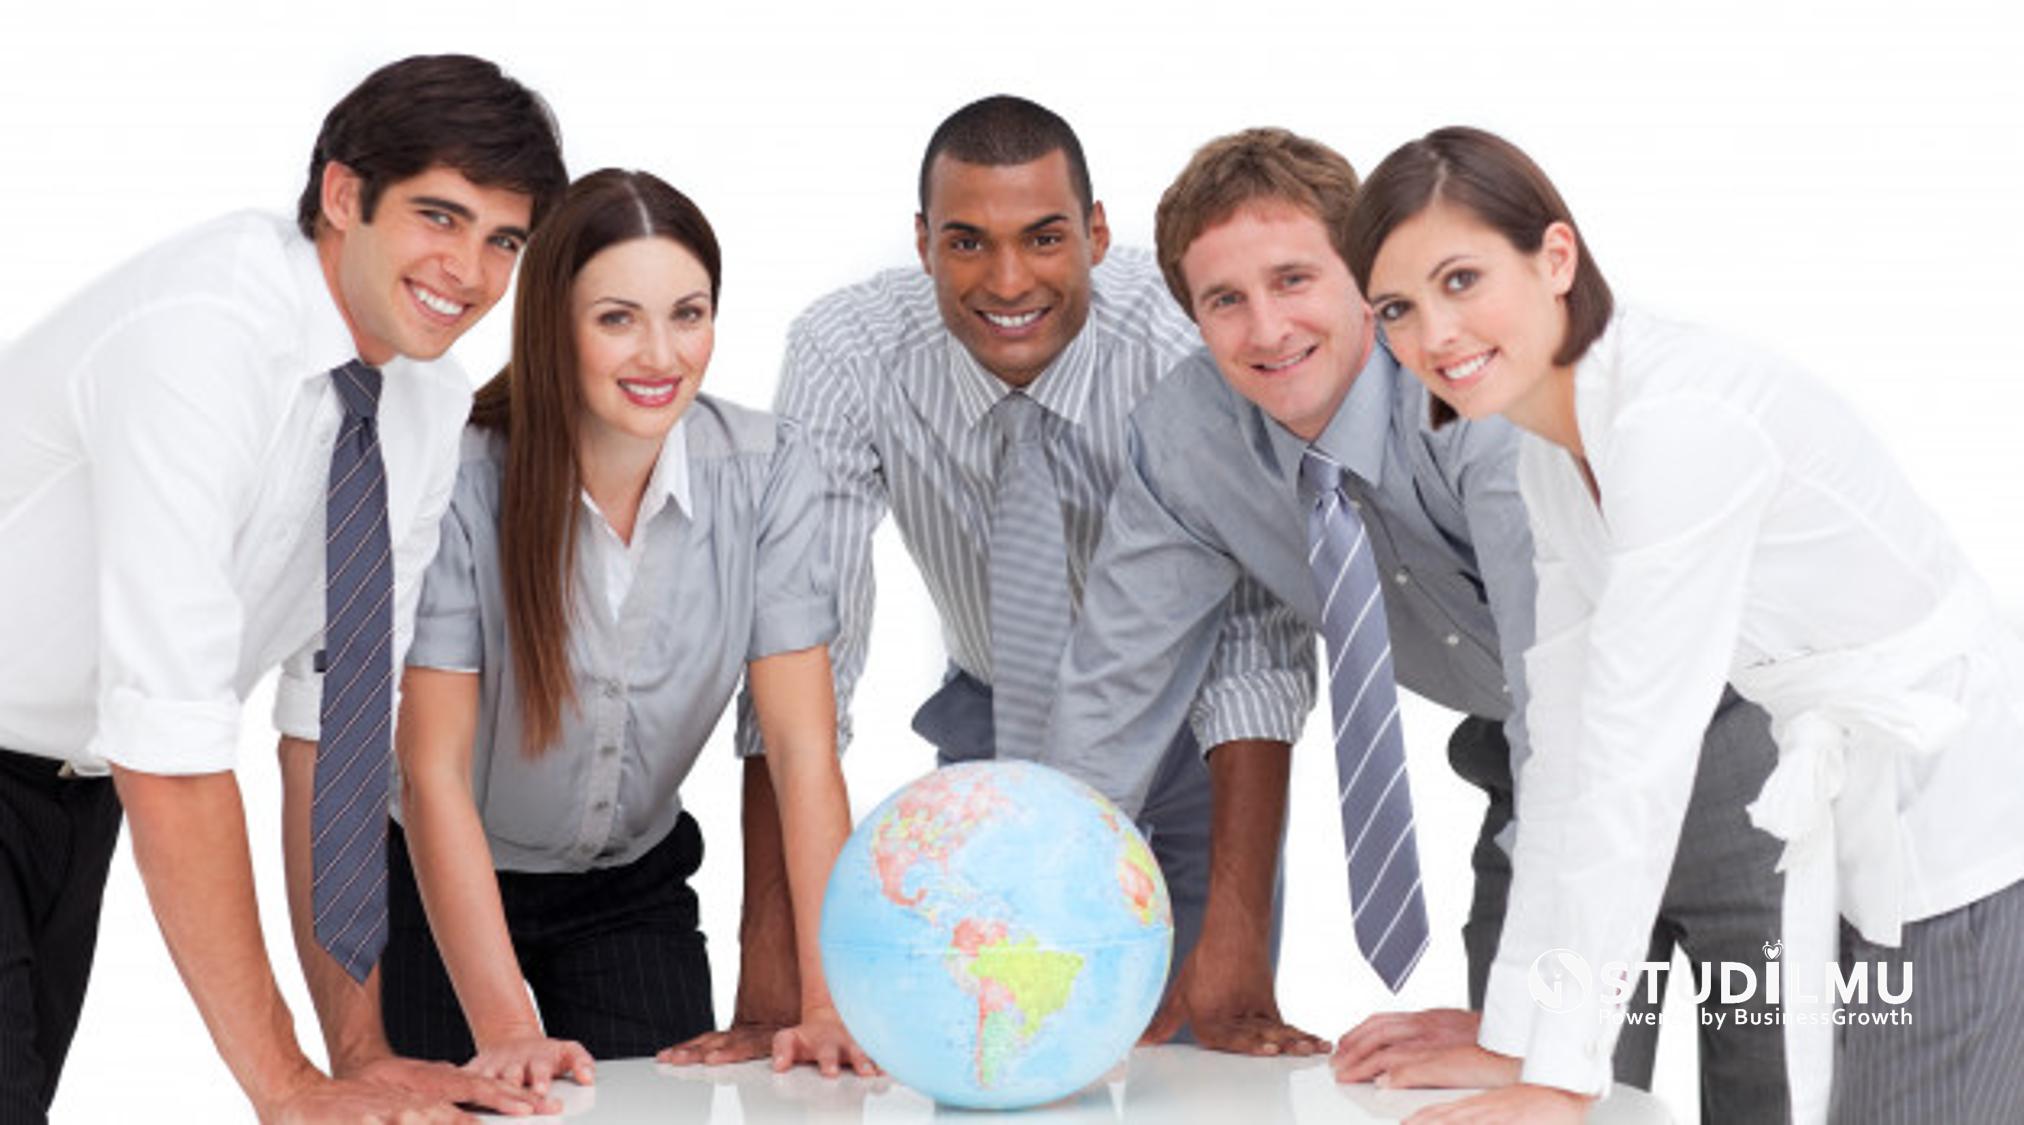 STUDILMU Career Advice - Mengembangkan Executive Presence